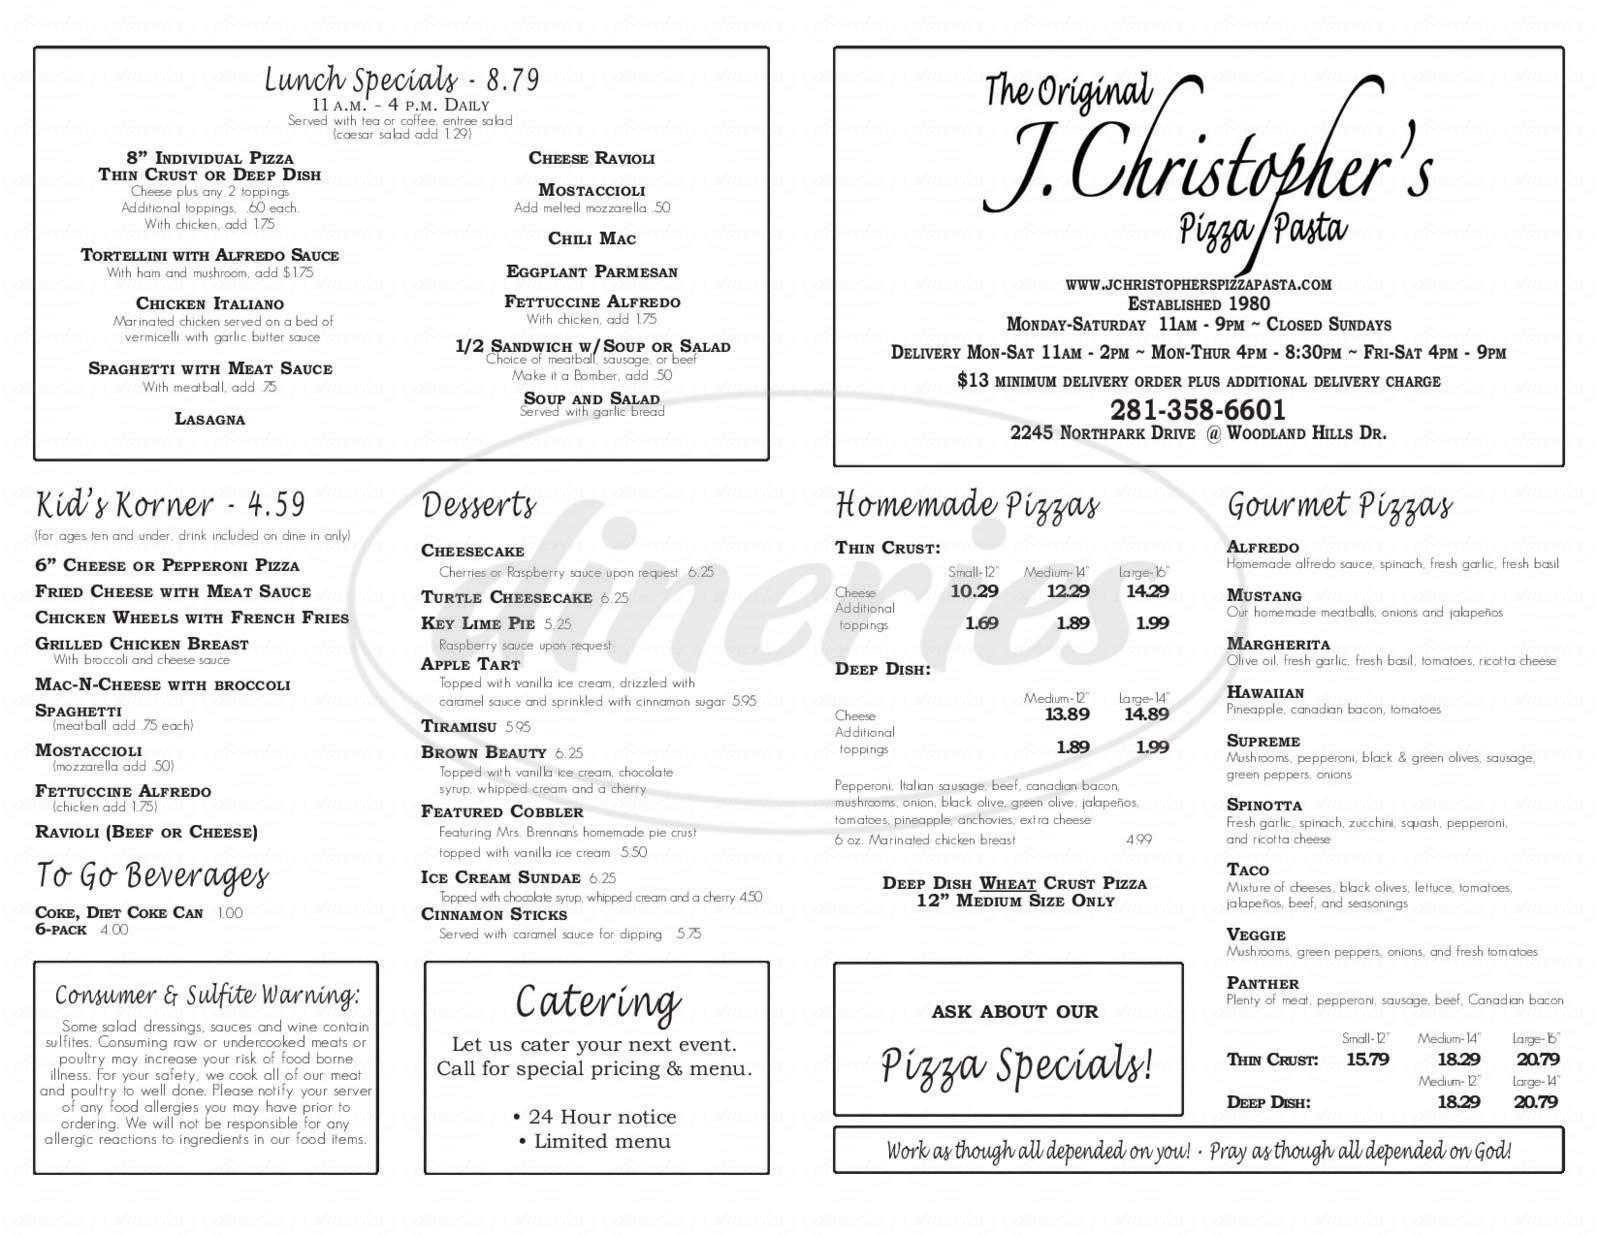 menu for J Christopher's Pizza Pasta